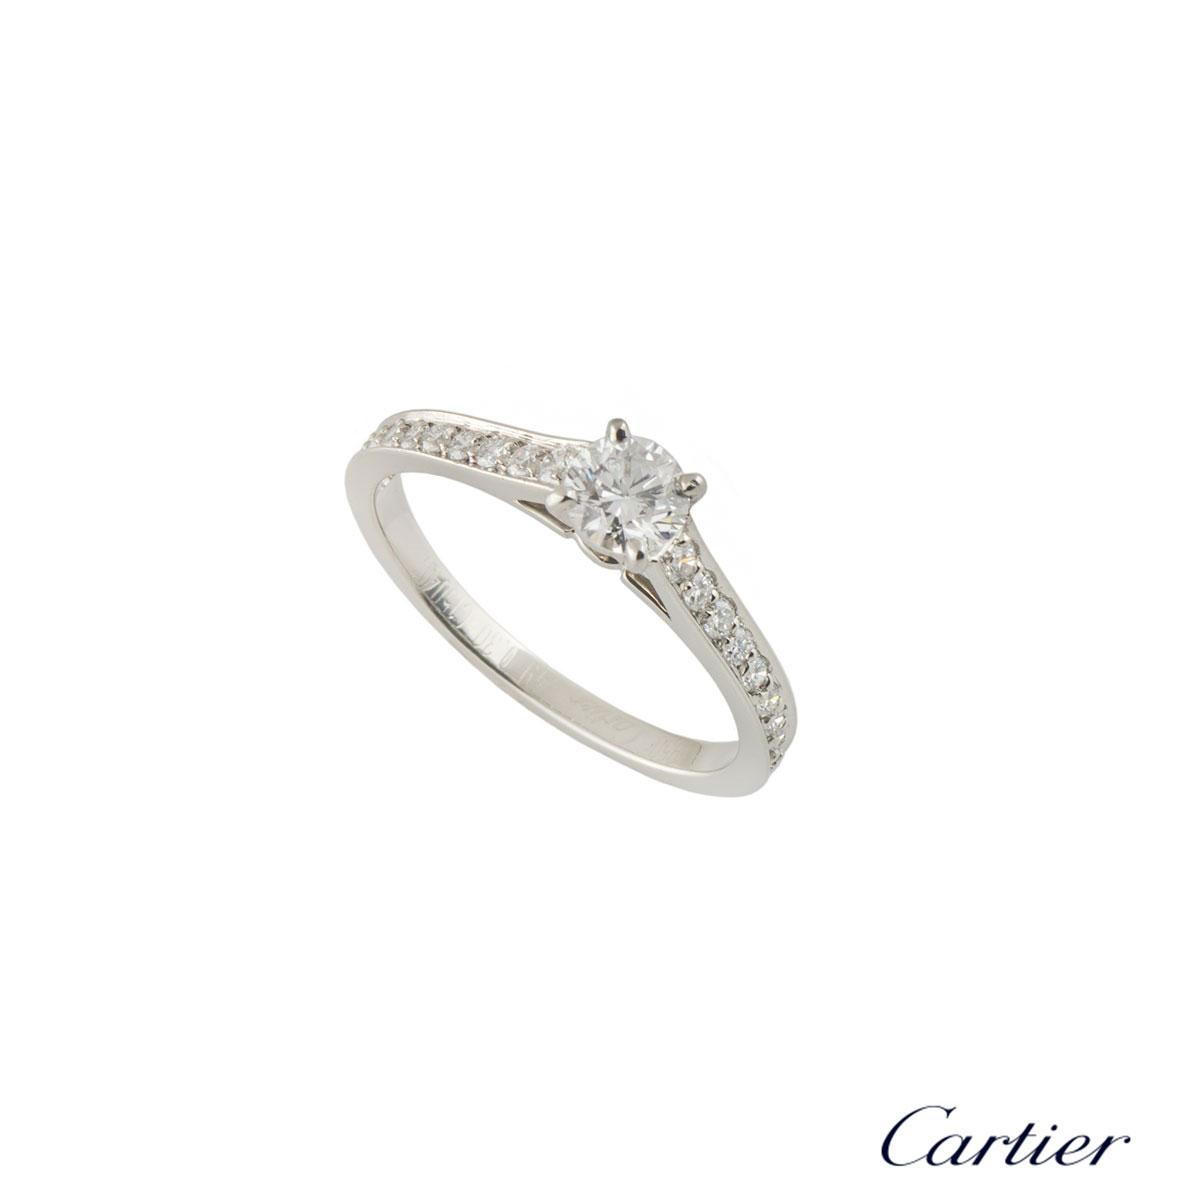 CartierPlatinum Diamond 1895 Solitaire Ring Size 49N4164649